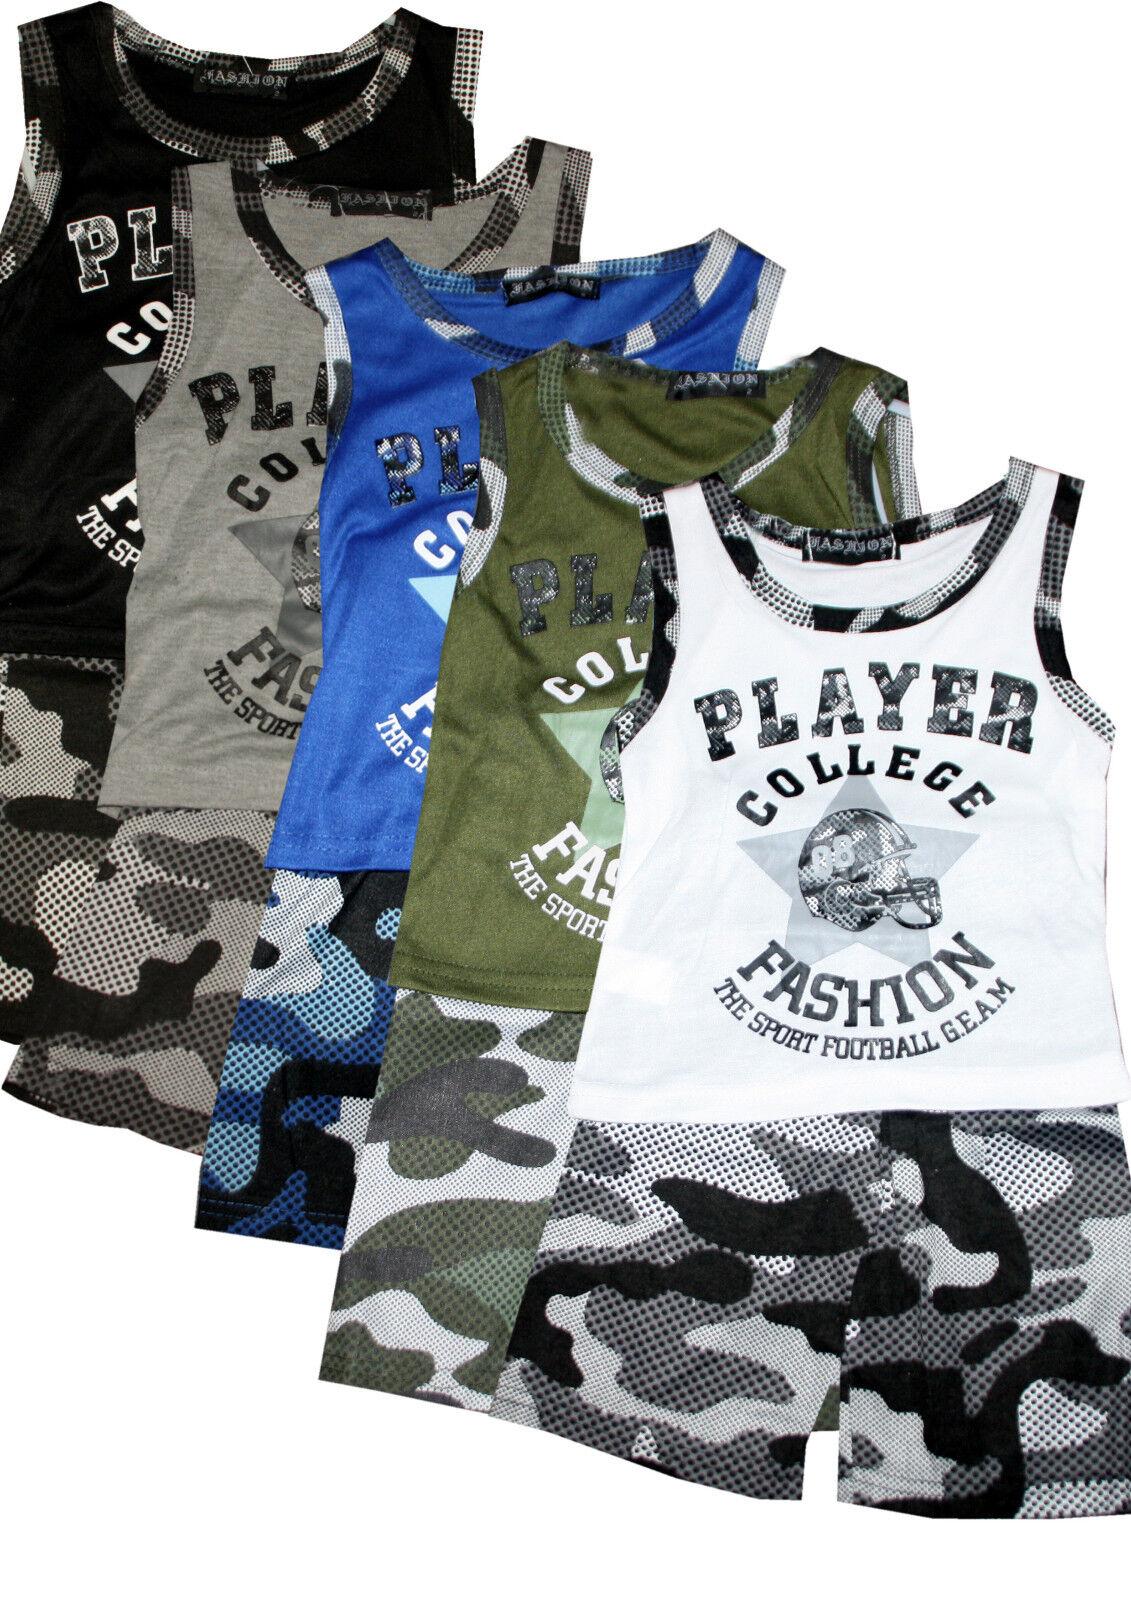 Kindersommer Set, Top und Shorts, Sportset, Camounflage, 2- Teiler